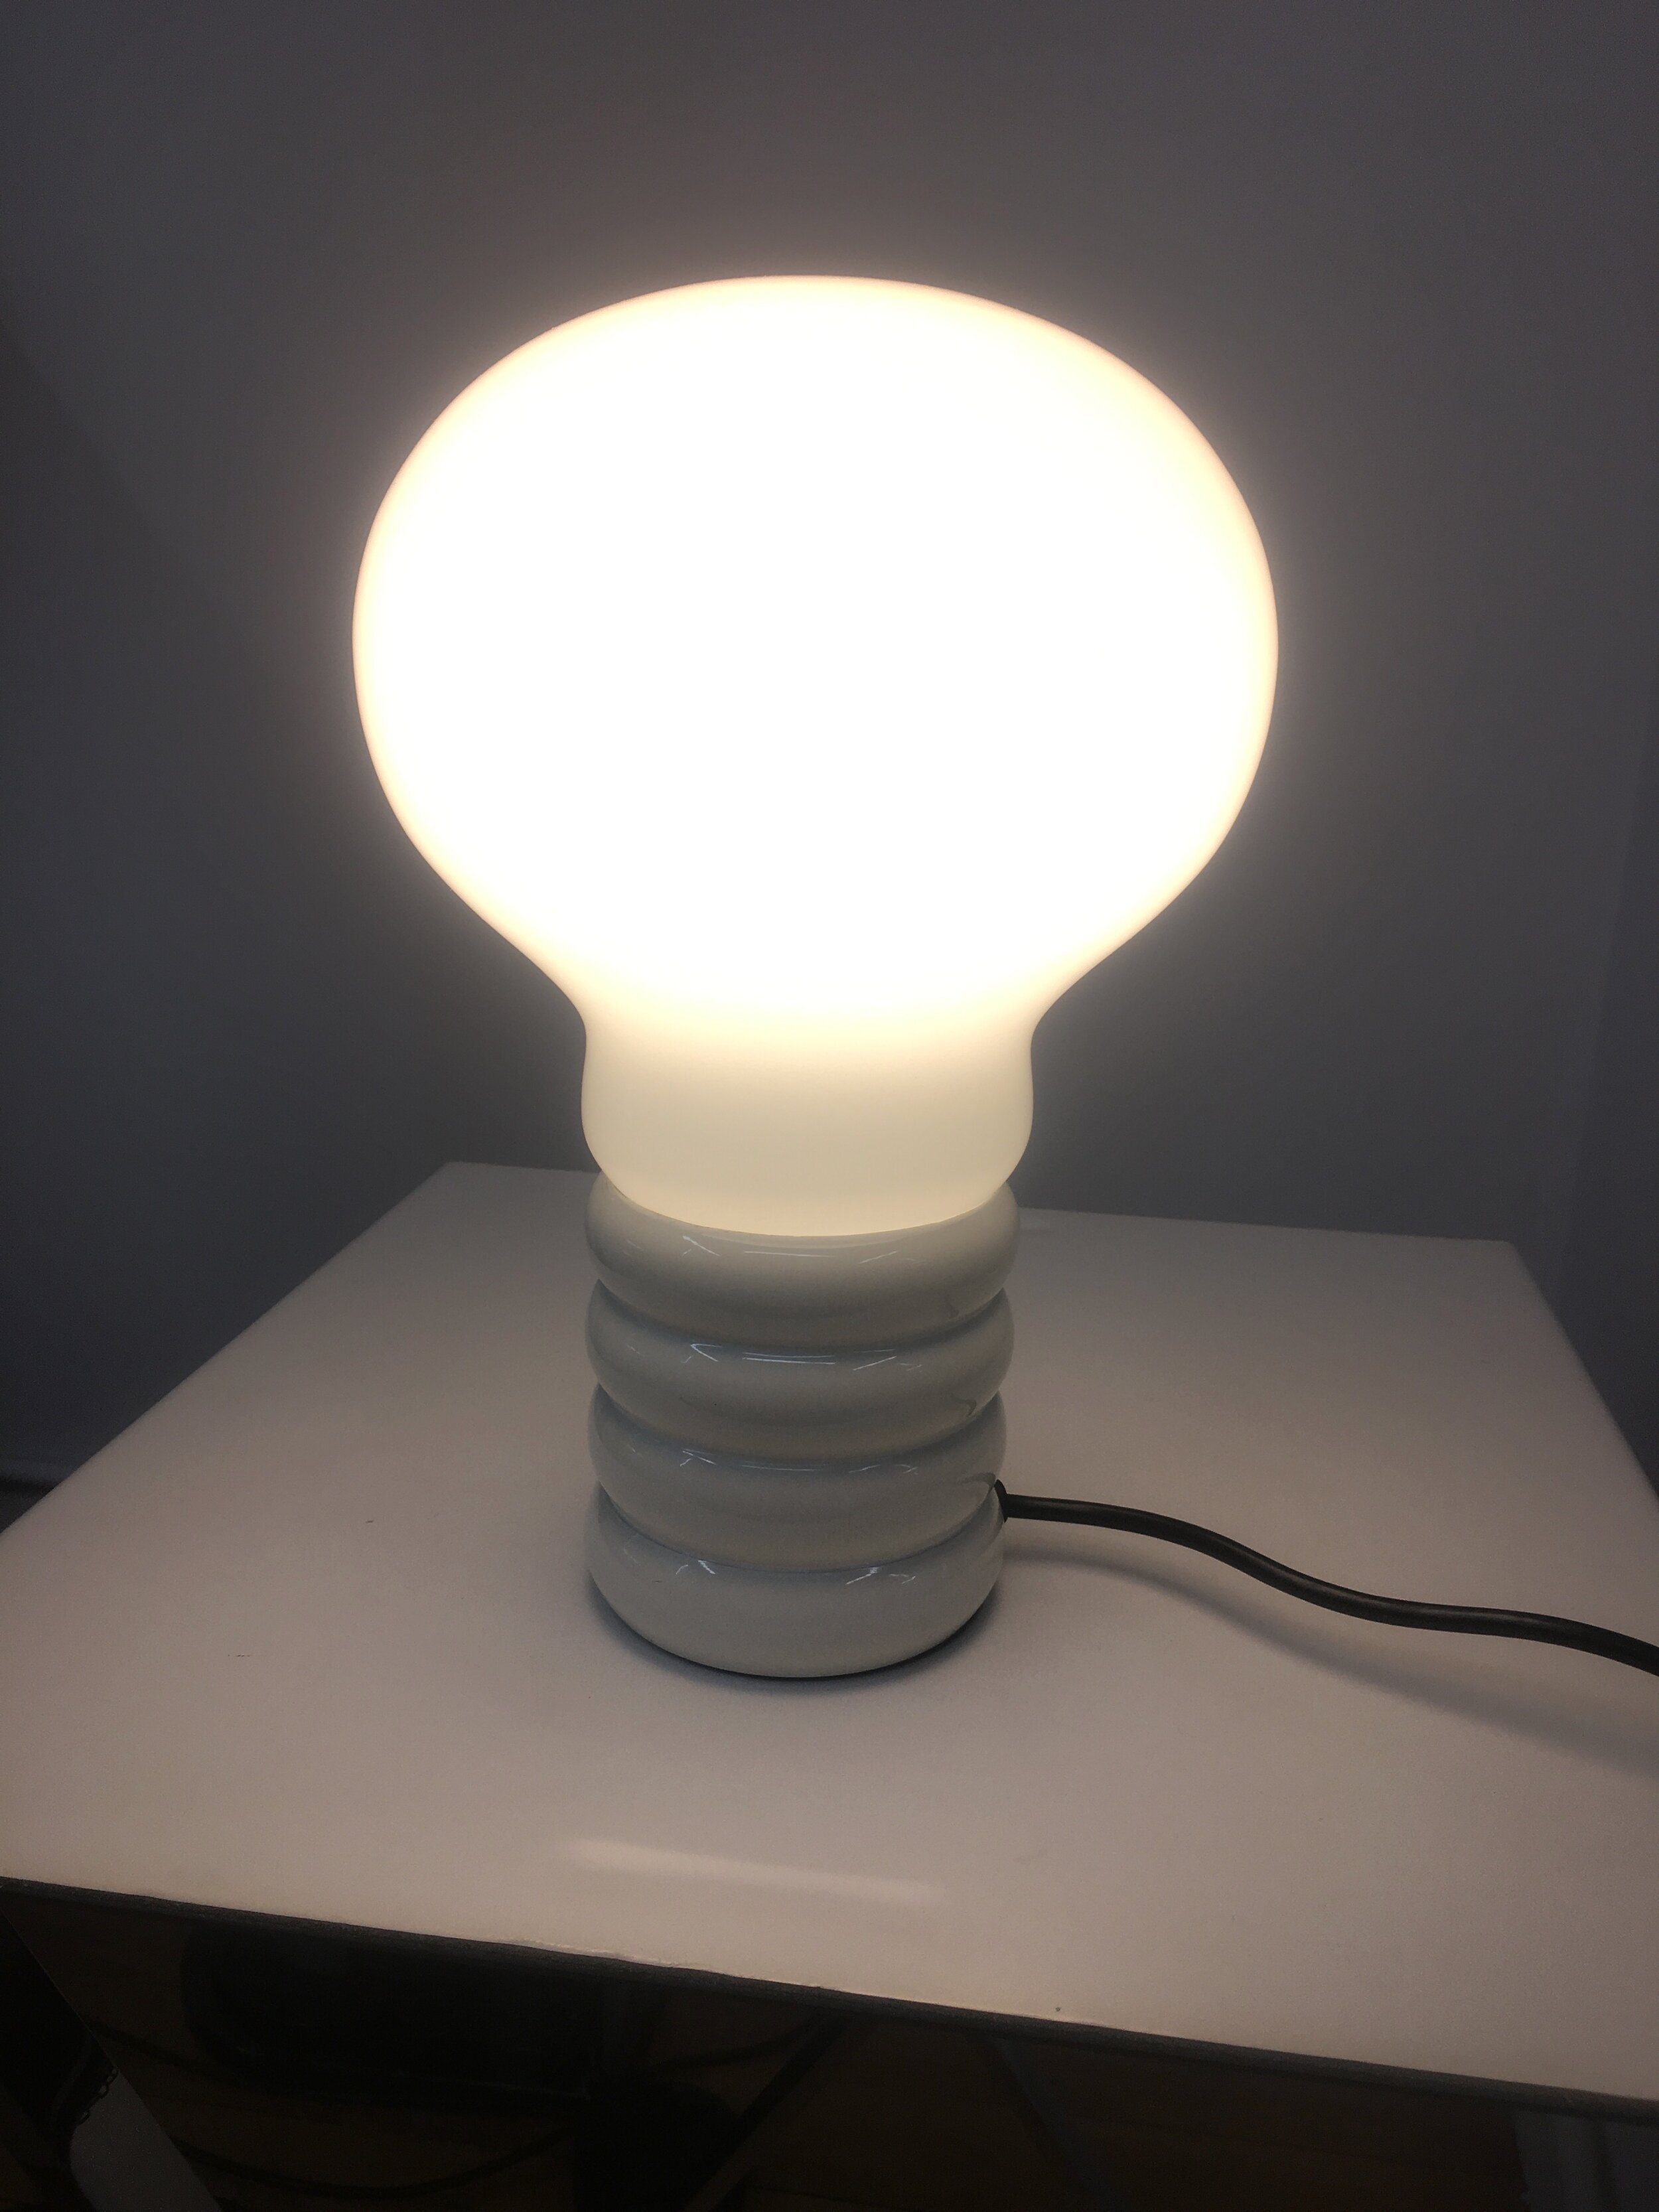 mid-century-modern-designer-lighting-20th-century-lamps-design00004.jpg